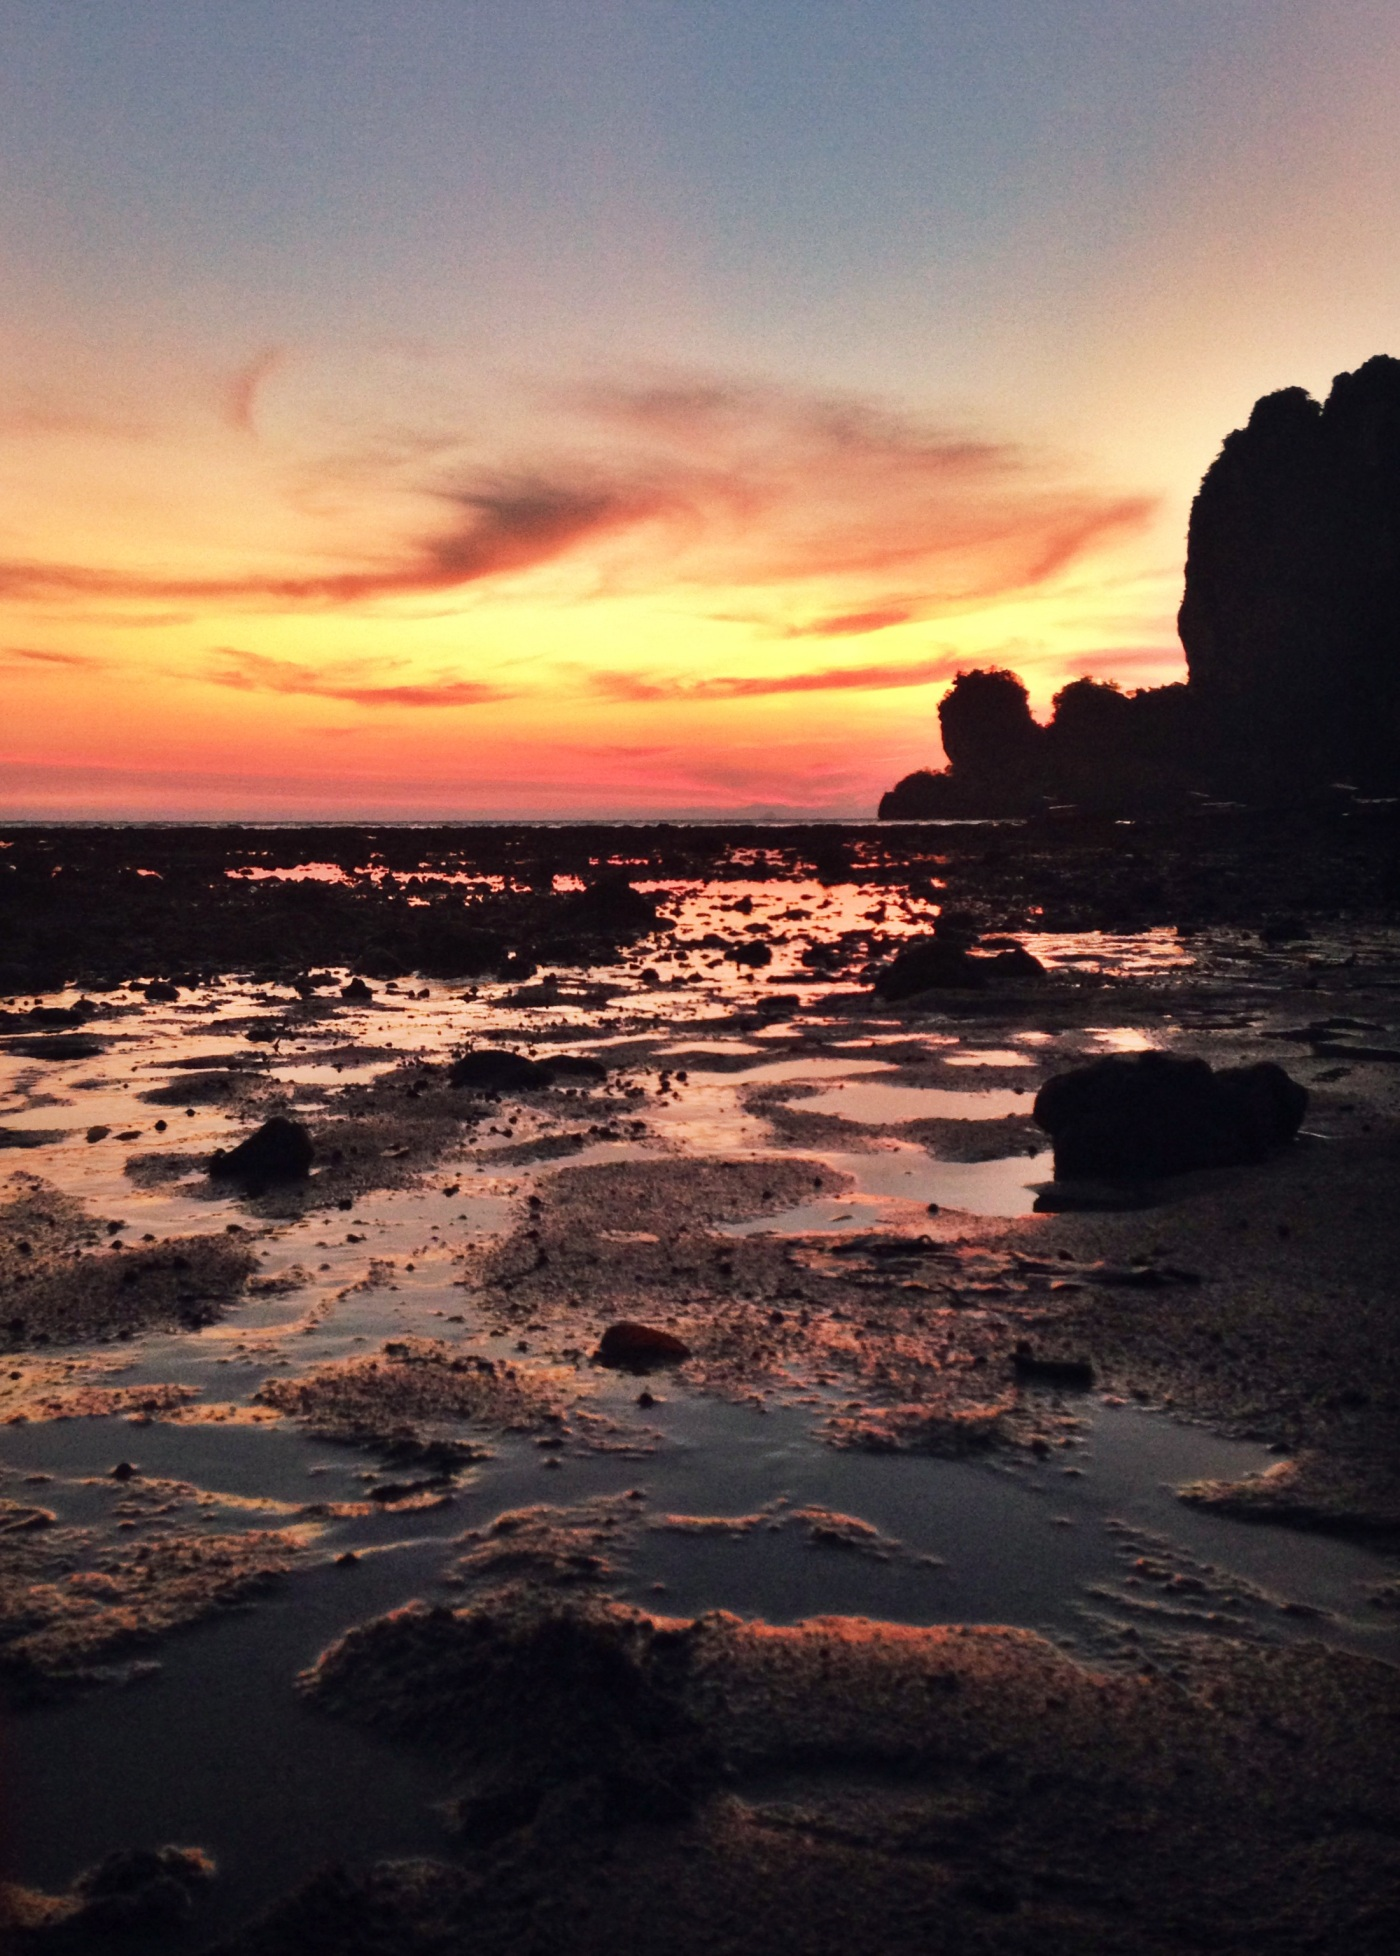 The famed Tonsai sunset